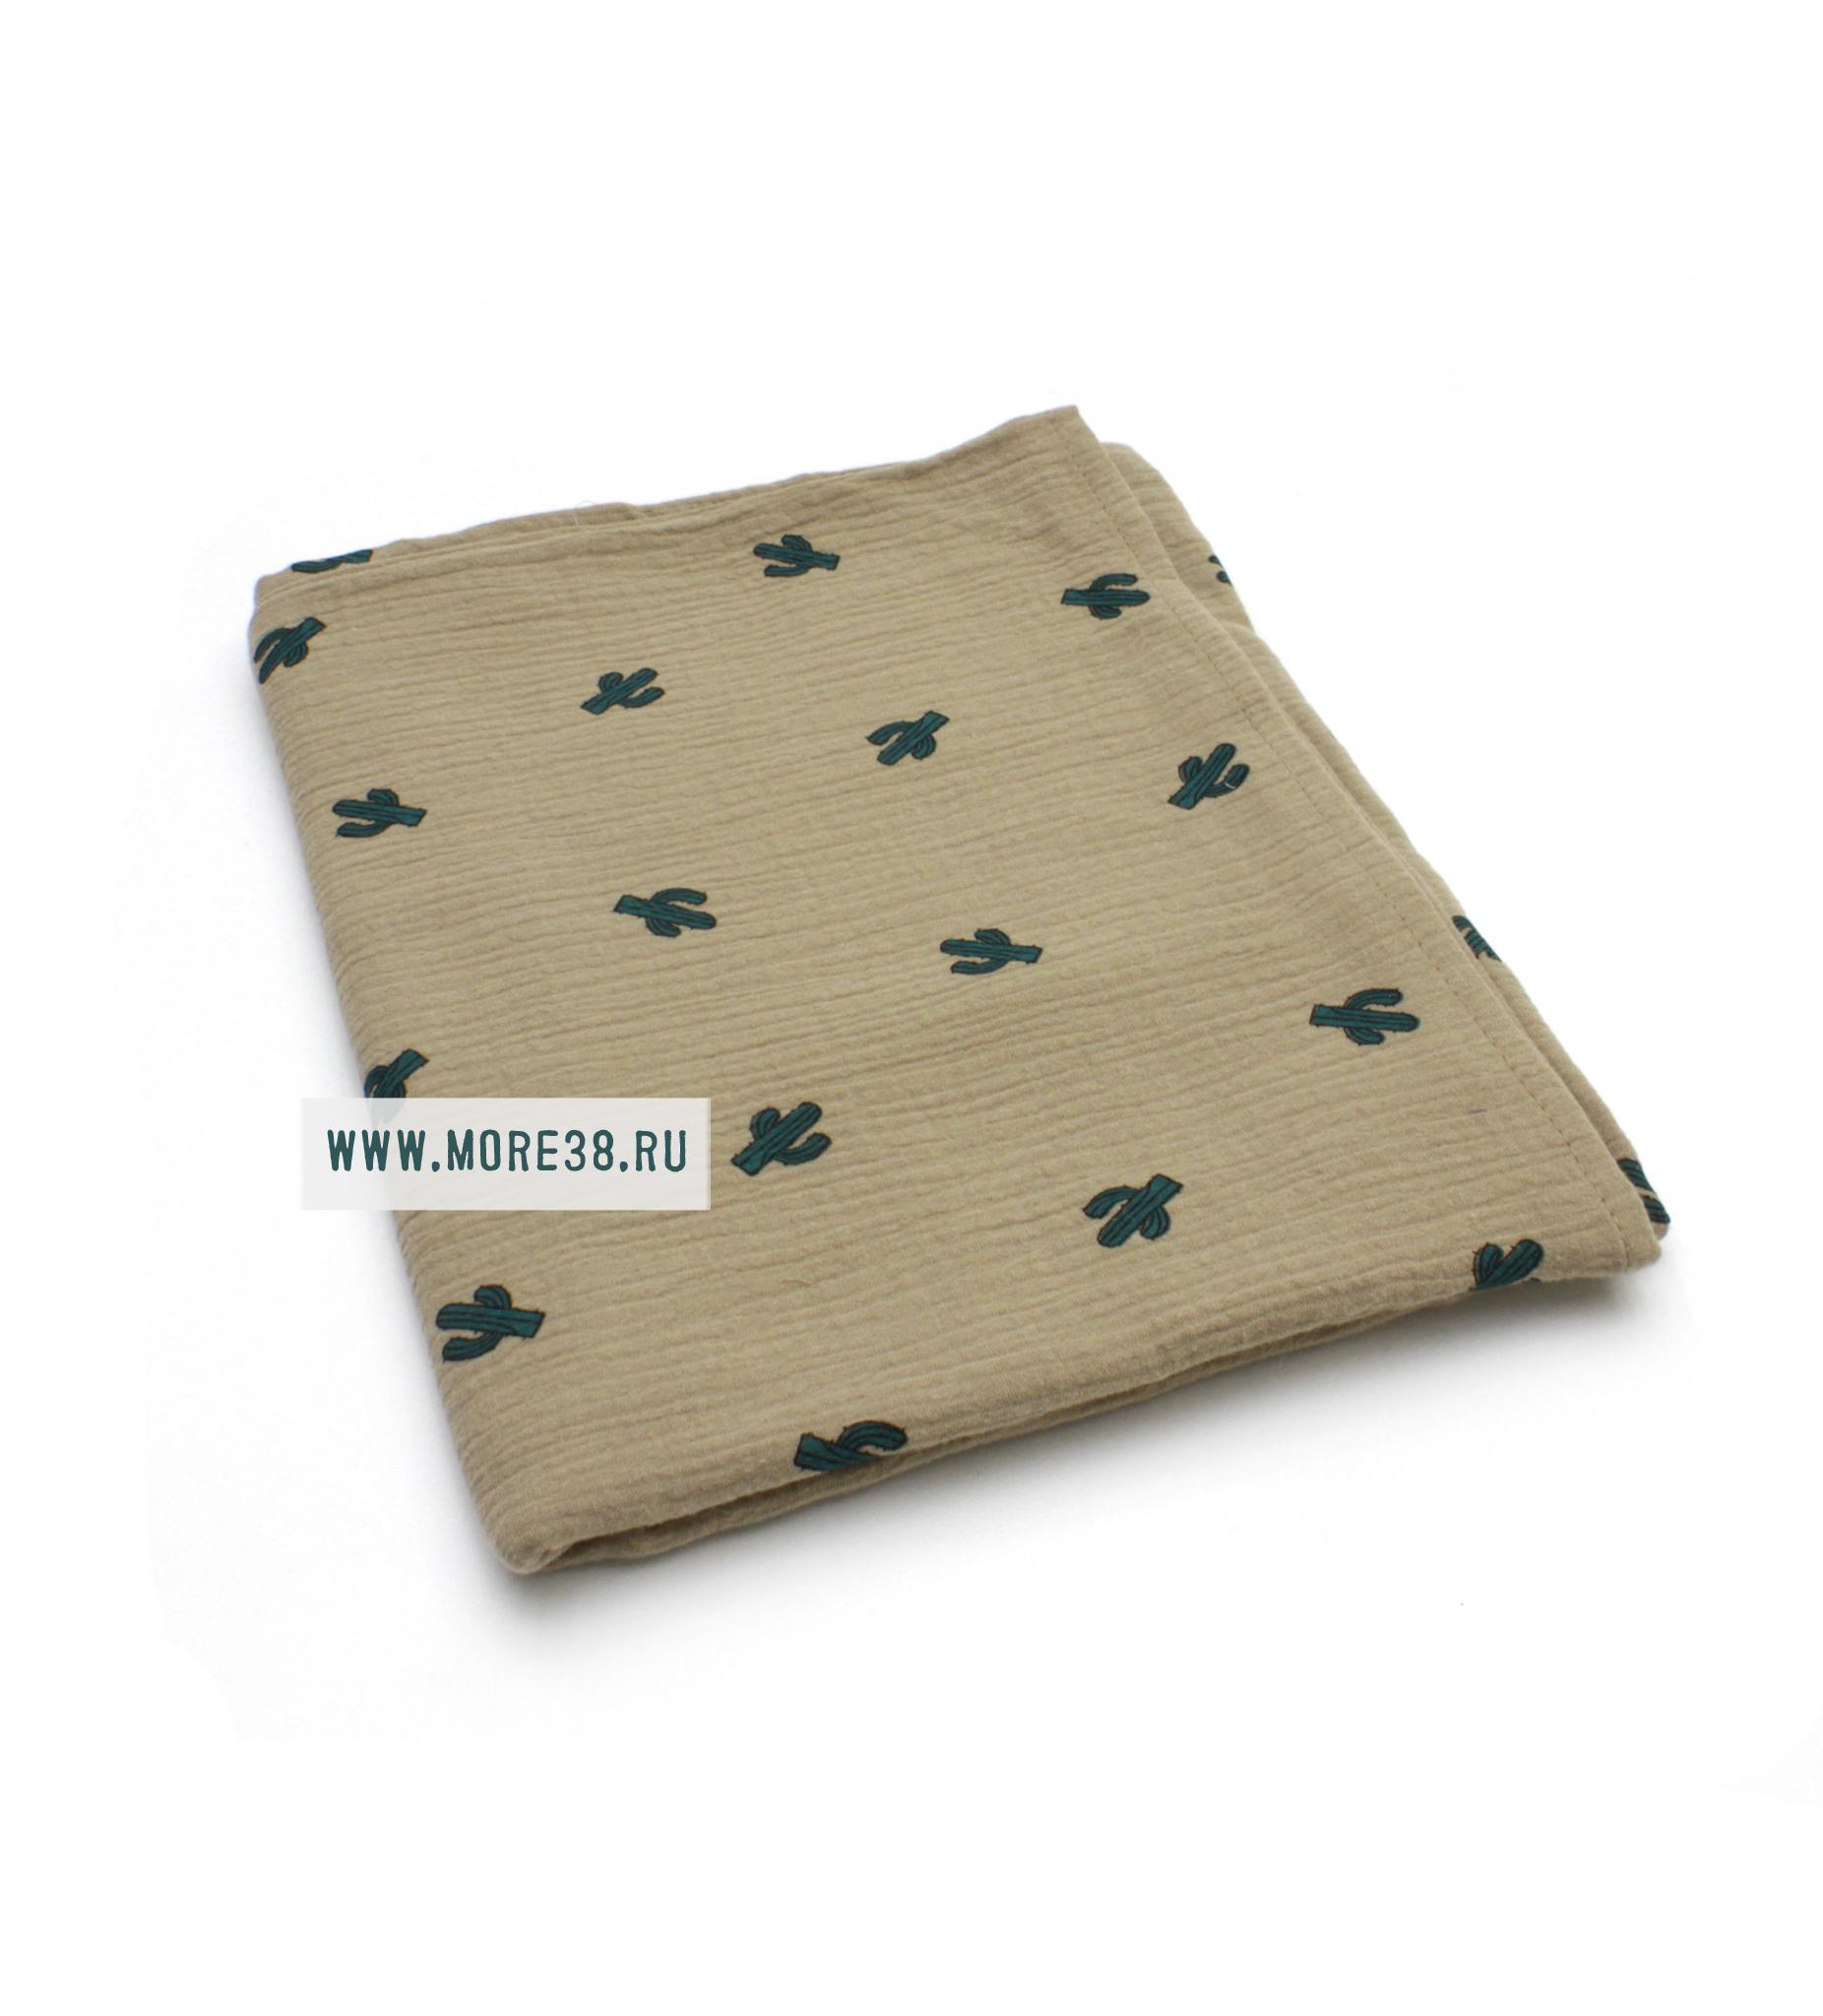 Муслиновая пеленка-кактусы на хаки (100х130см)